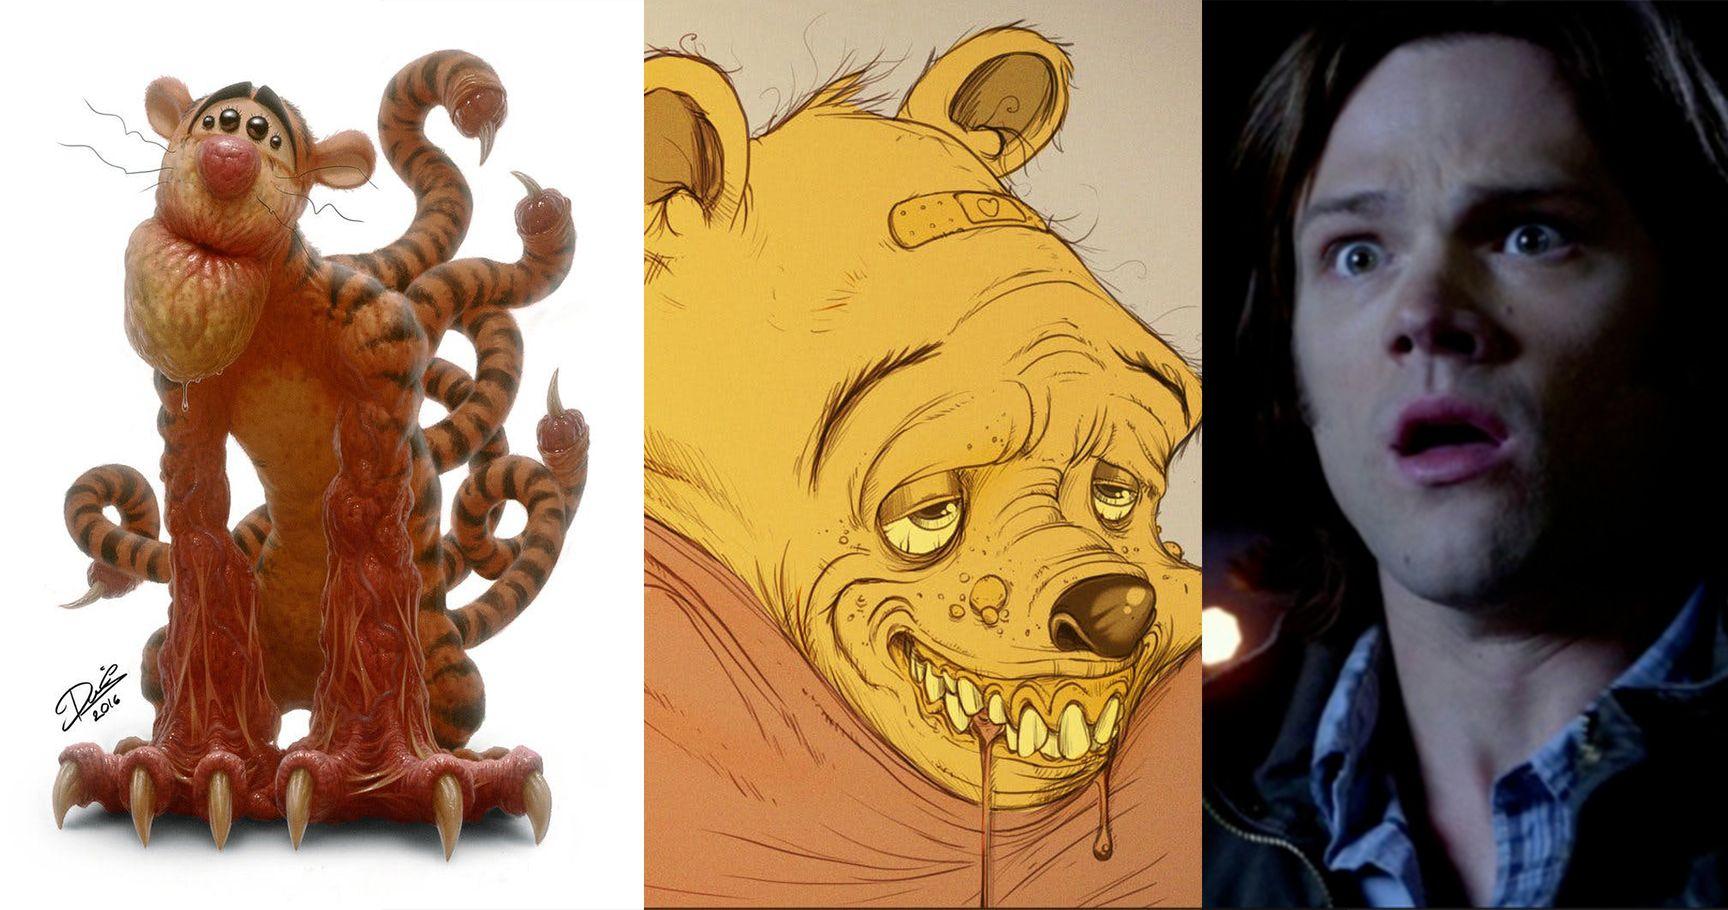 15 Disney Fan Artworks That Turned Fairytales Into Nightmare Fuel